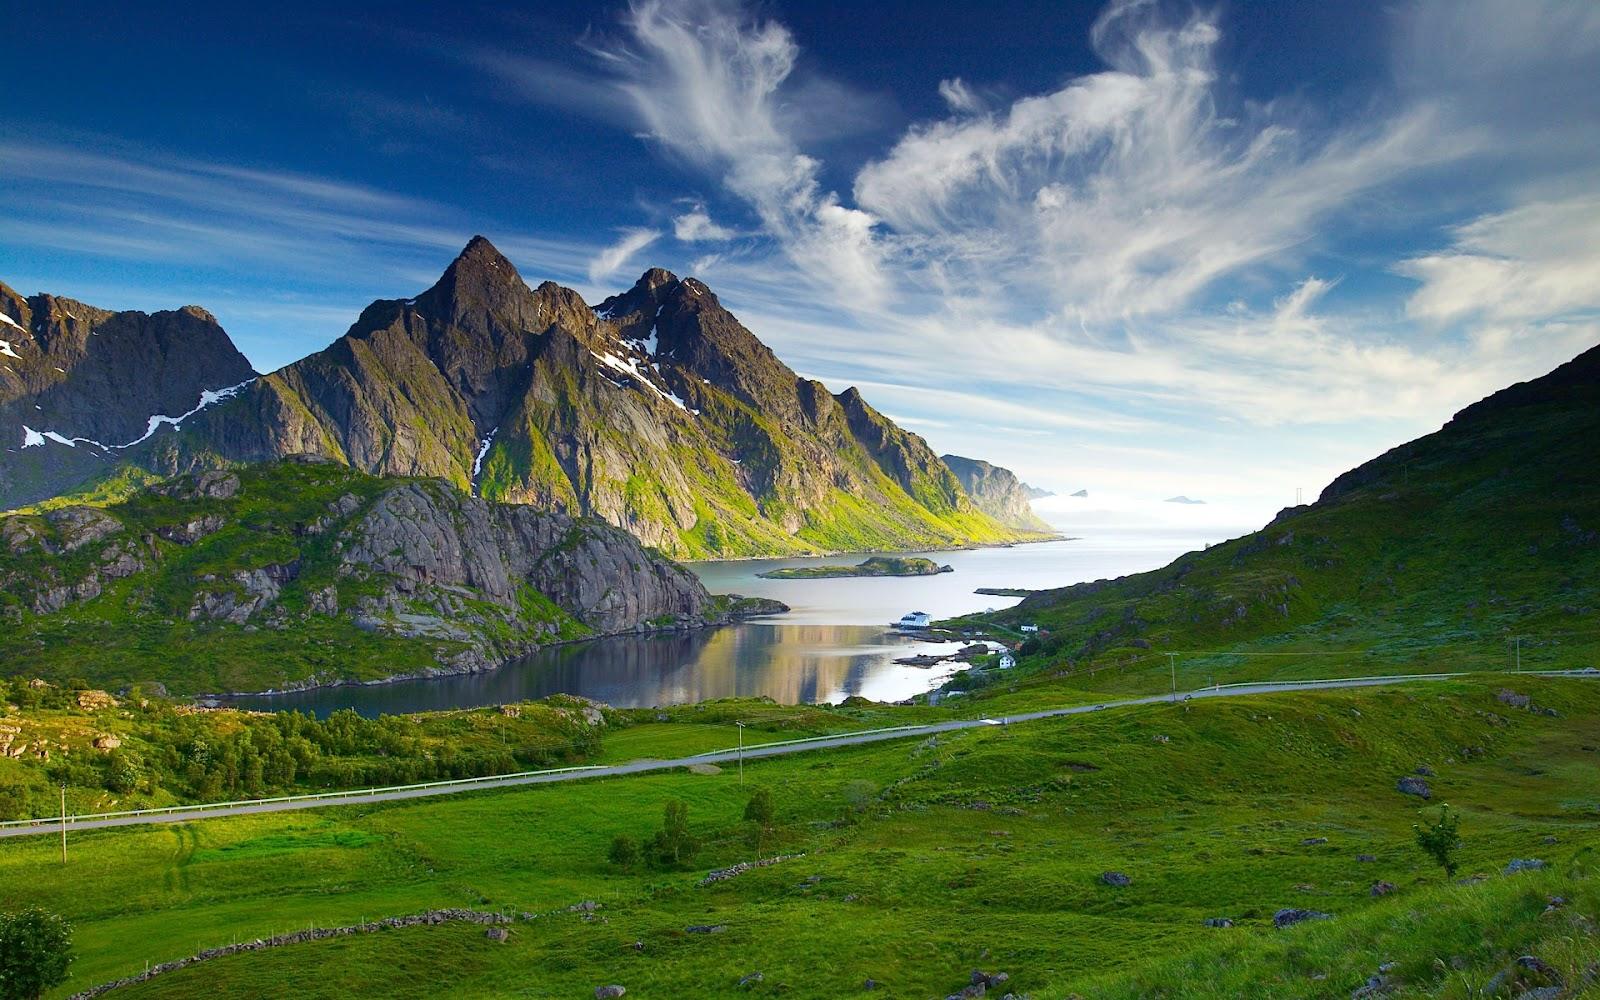 http://3.bp.blogspot.com/-7EQv2oaB8oQ/T_jkZe9eeyI/AAAAAAAAAGw/igKDp8W9r6M/s1600/beautiful-nordic-landscapes-beautiful-nature-wallpapers-for-desktop-widescreen.jpg